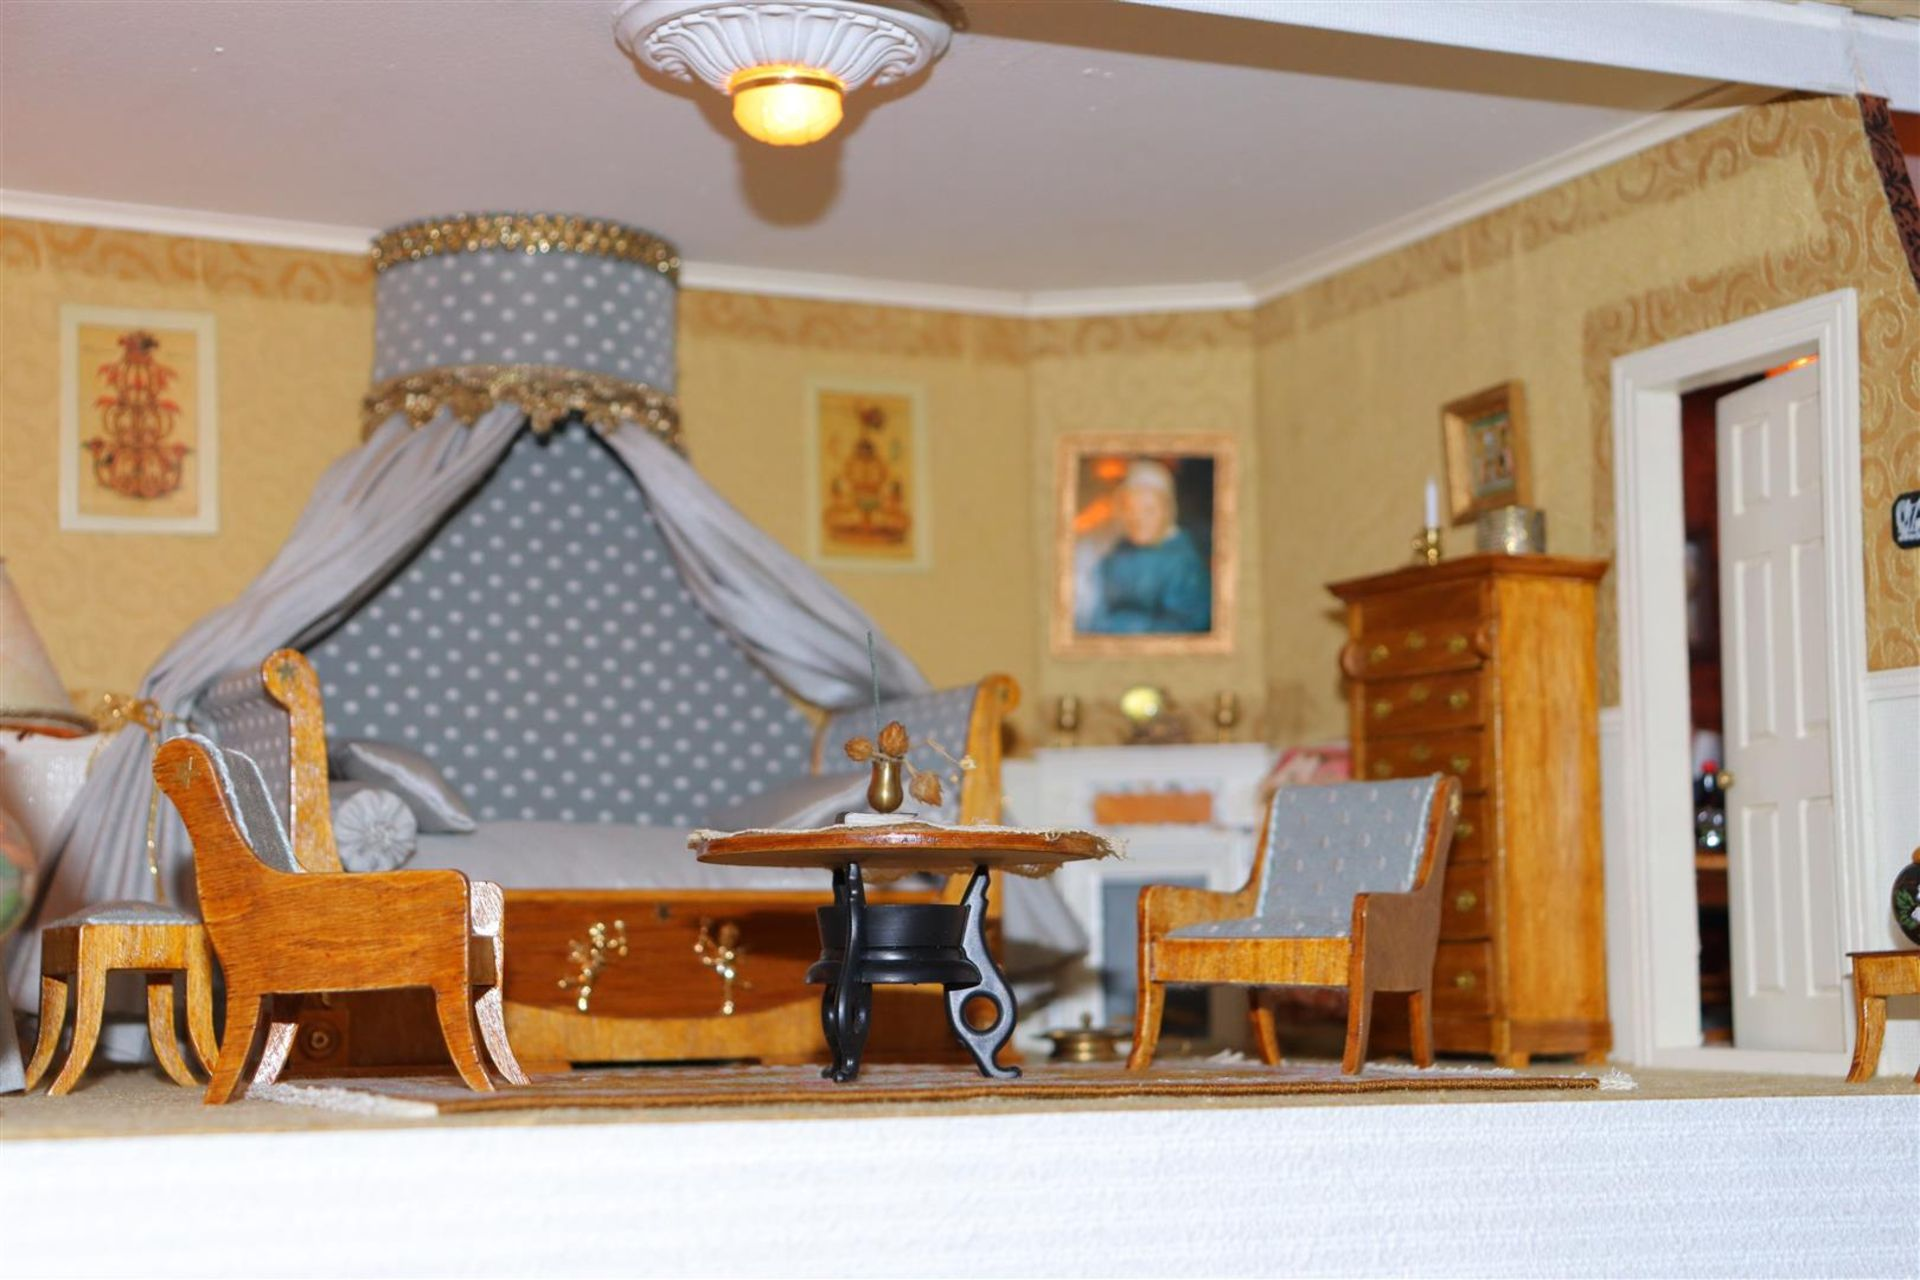 Dollhouse De Kettenborgh by Mrs. J C Wirix Kettenborg - Image 52 of 106